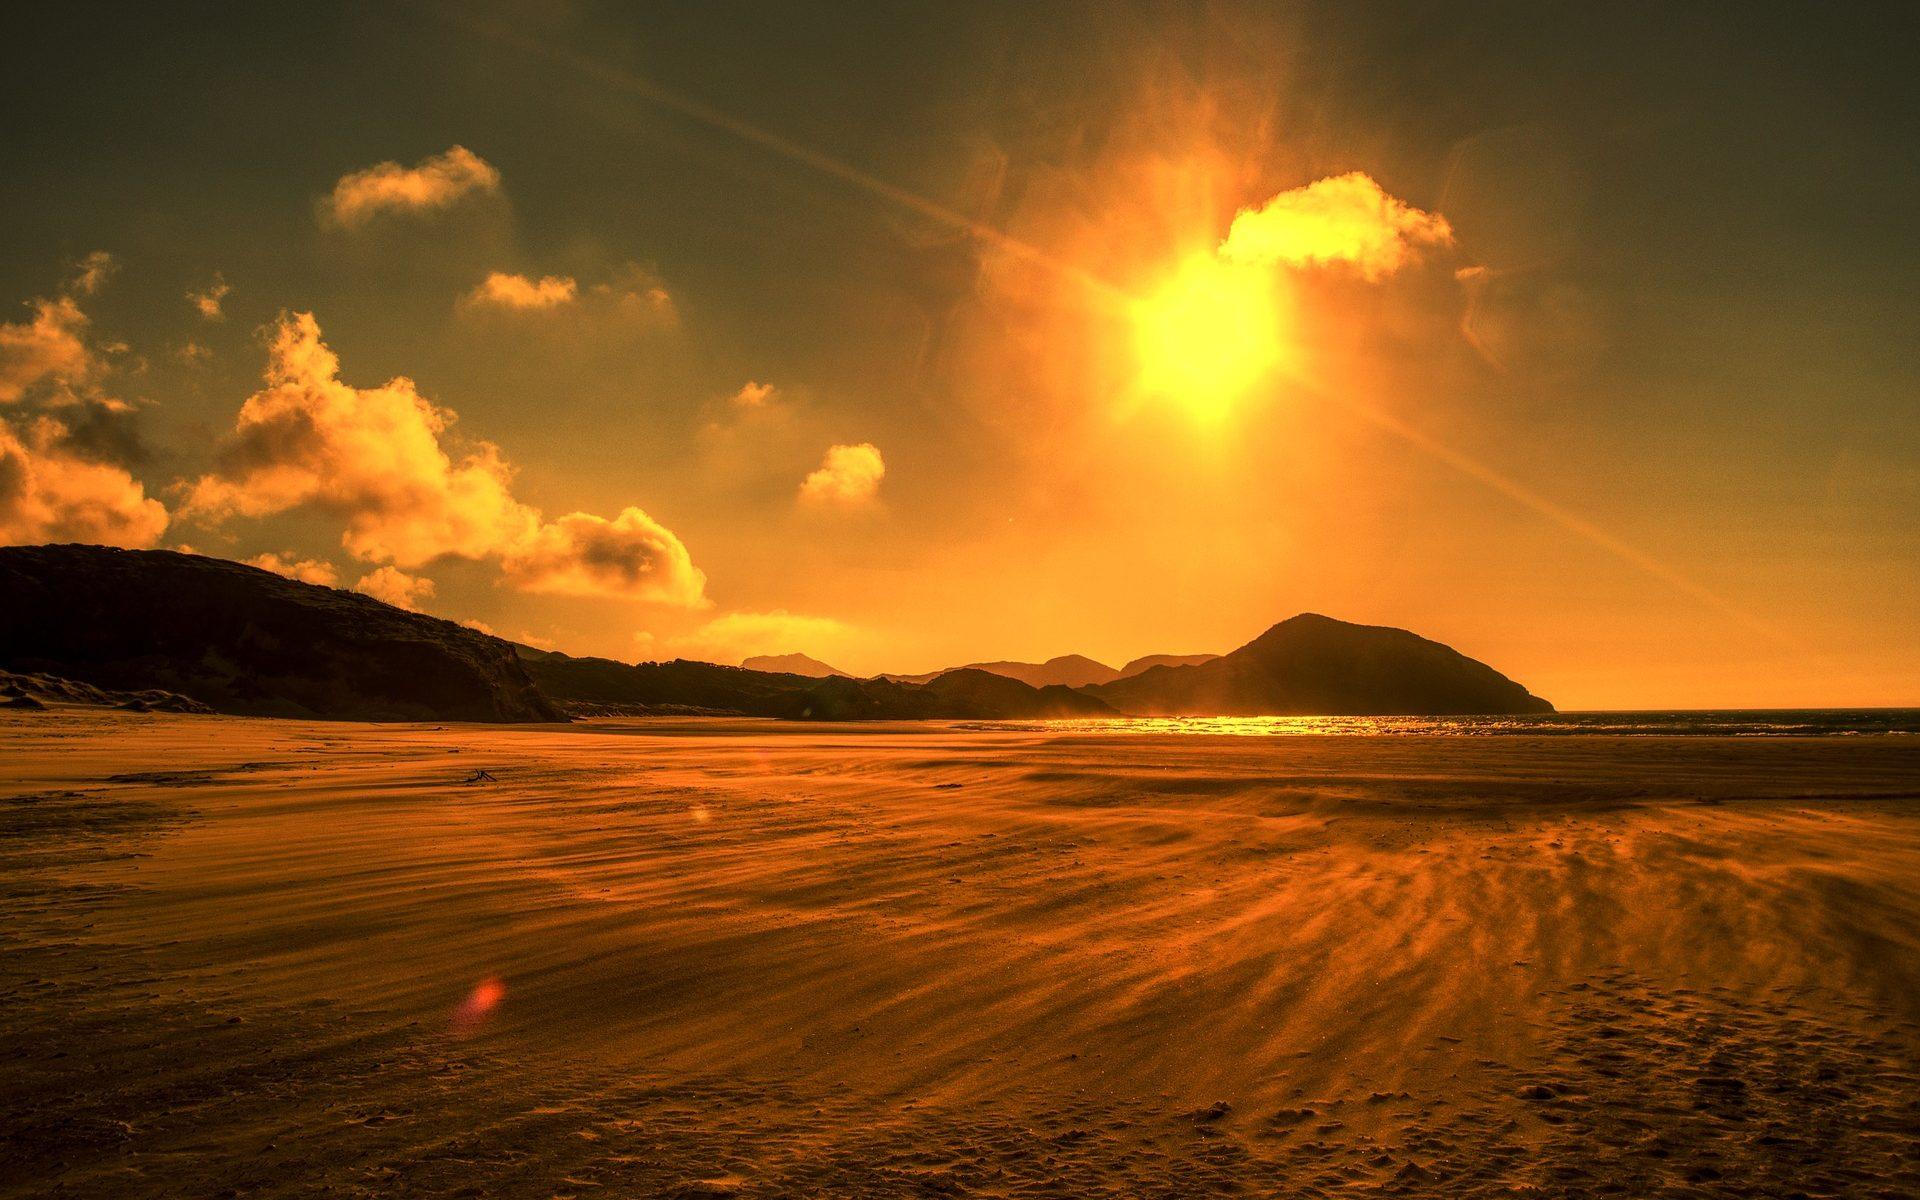 Beach with blazing sun in sky